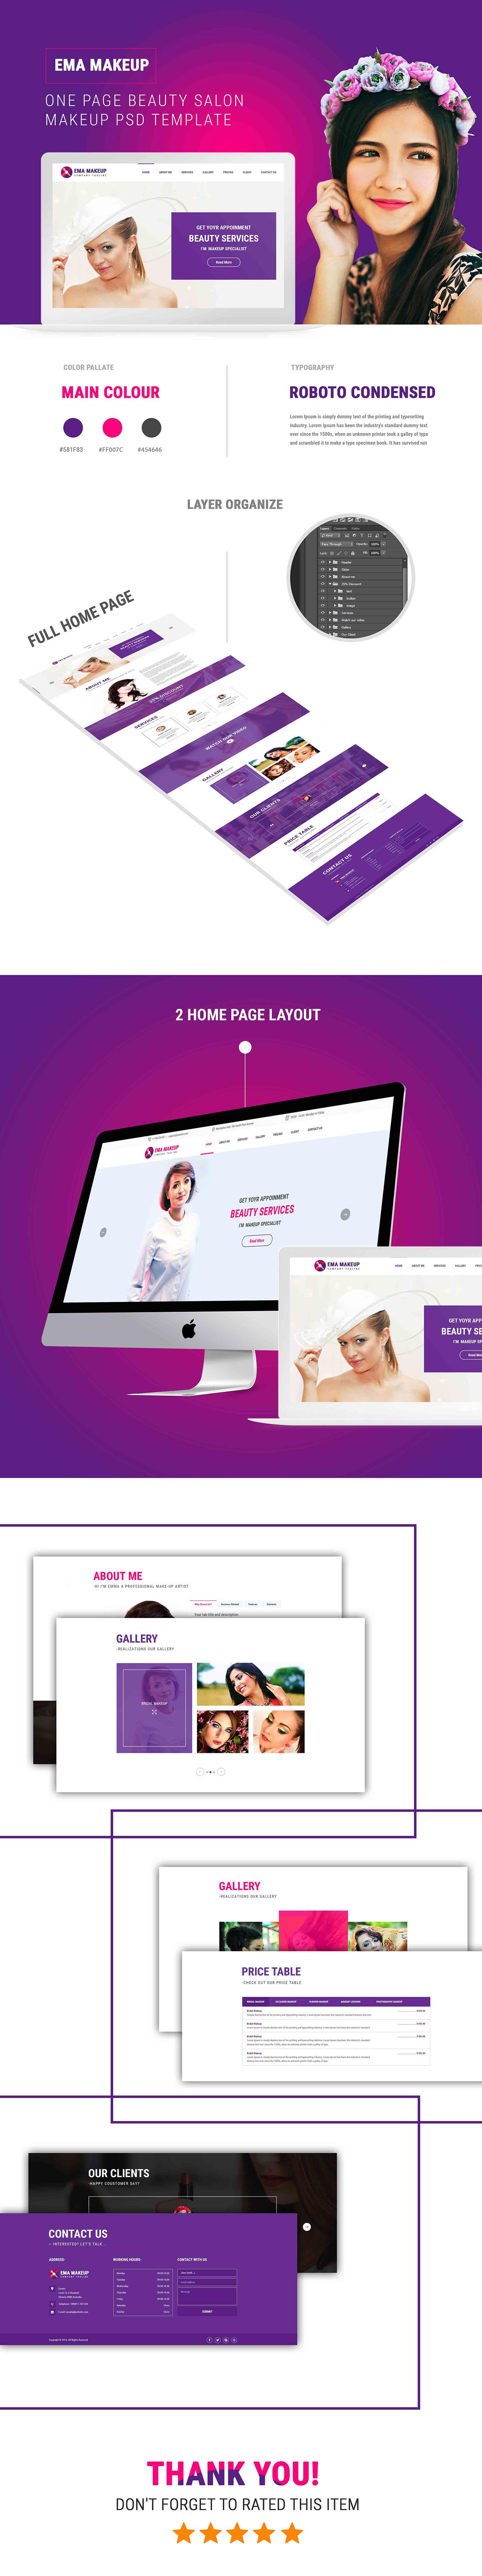 Ema Makeup - One Page Beauty Salon Makeup HTML Template - 1